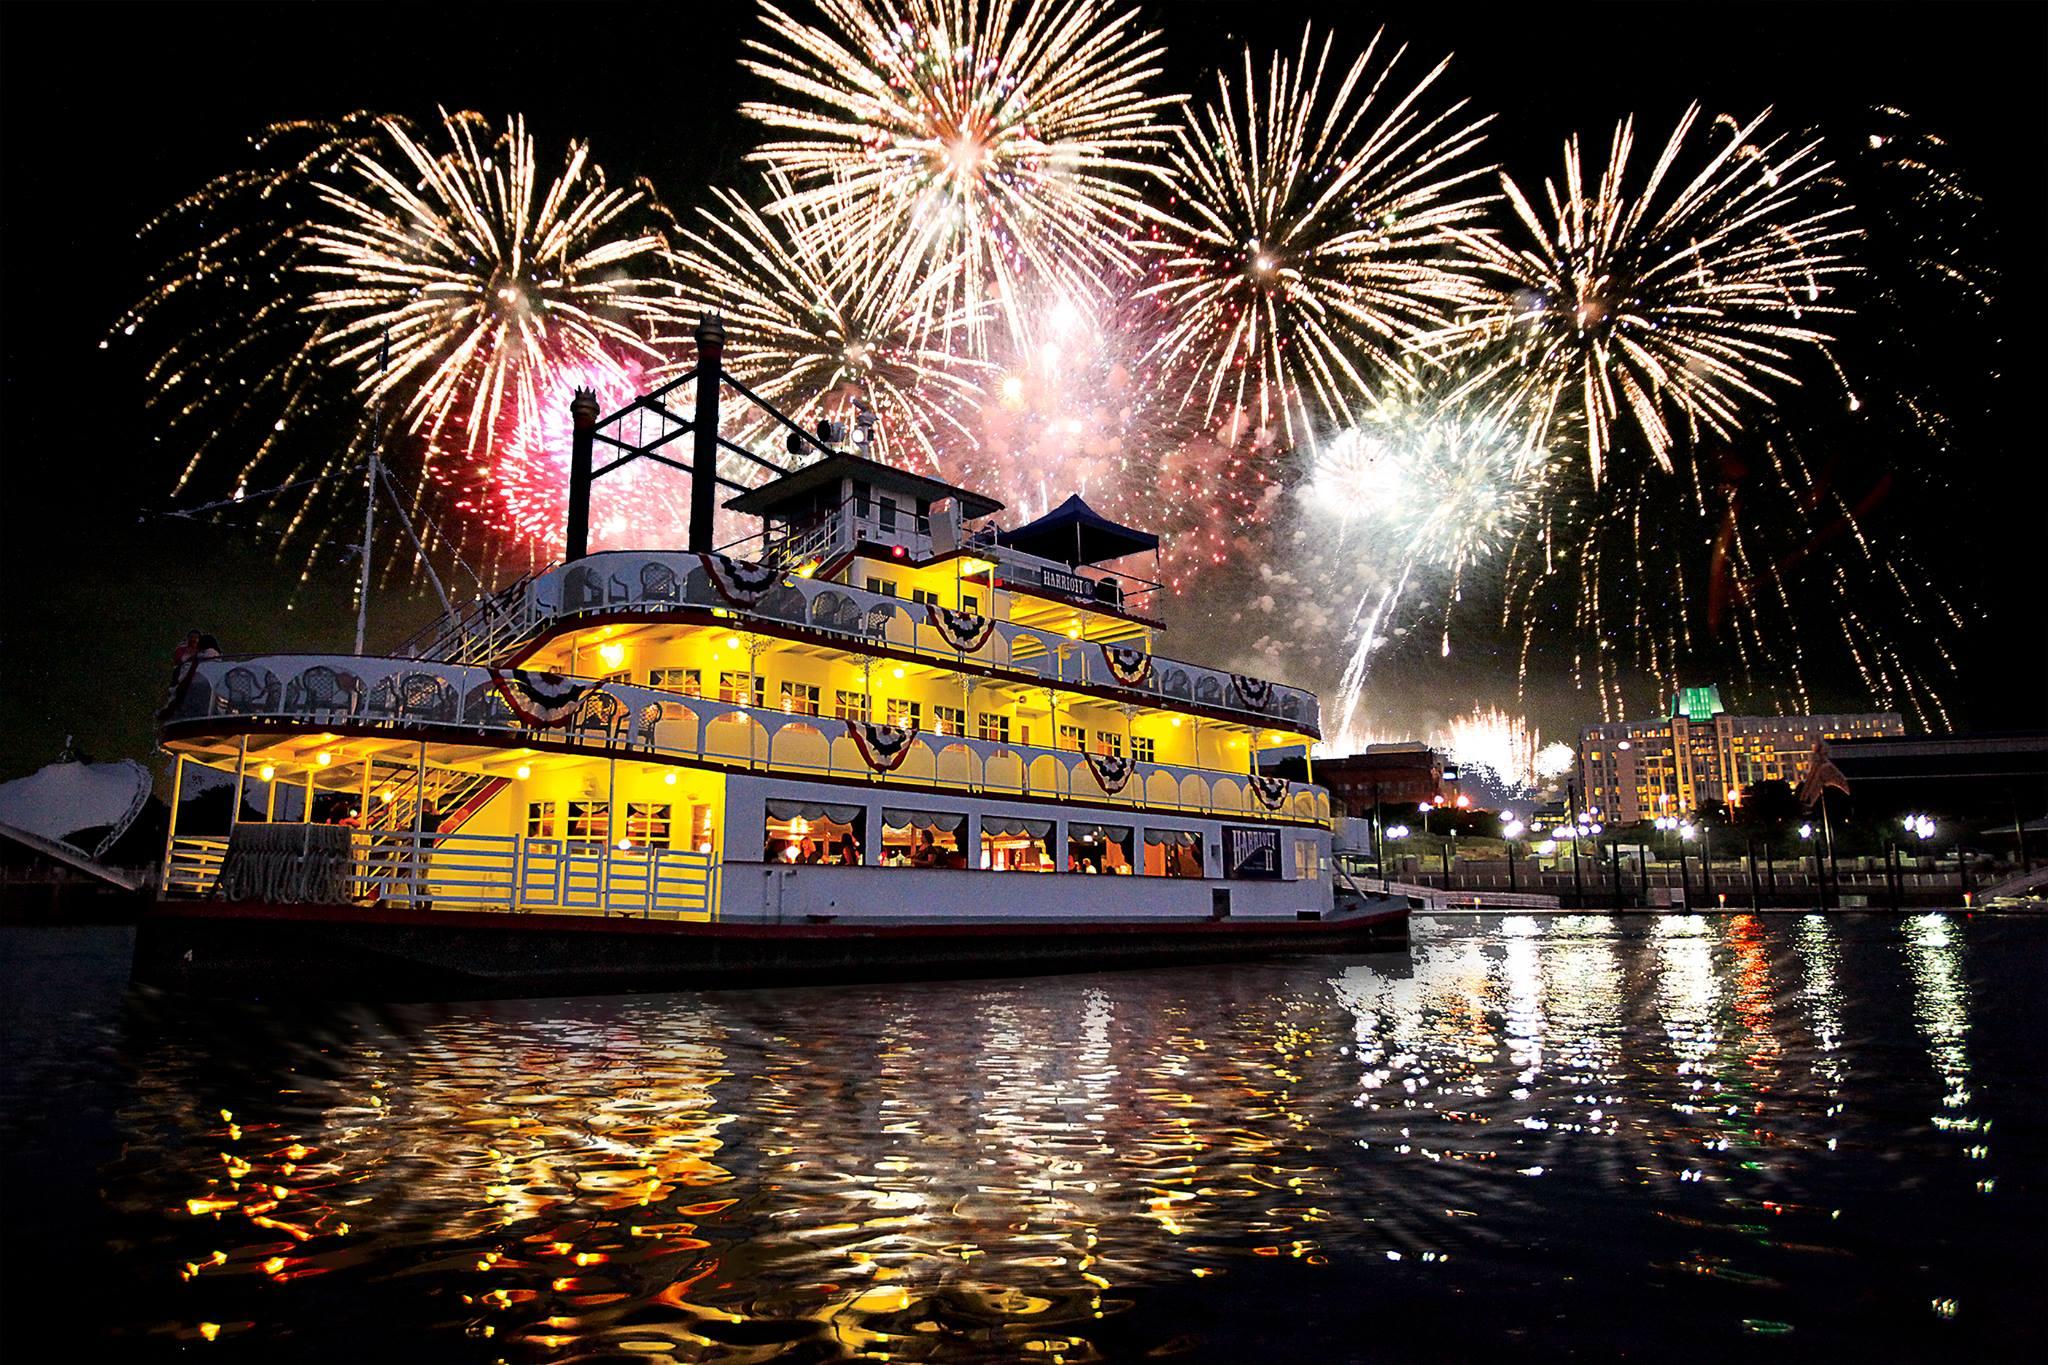 https://alabama-travel.s3.amazonaws.com/partners-uploads/photo/image/56f9448157c3cbc27e000020/harriott_fireworks_pic.jpg